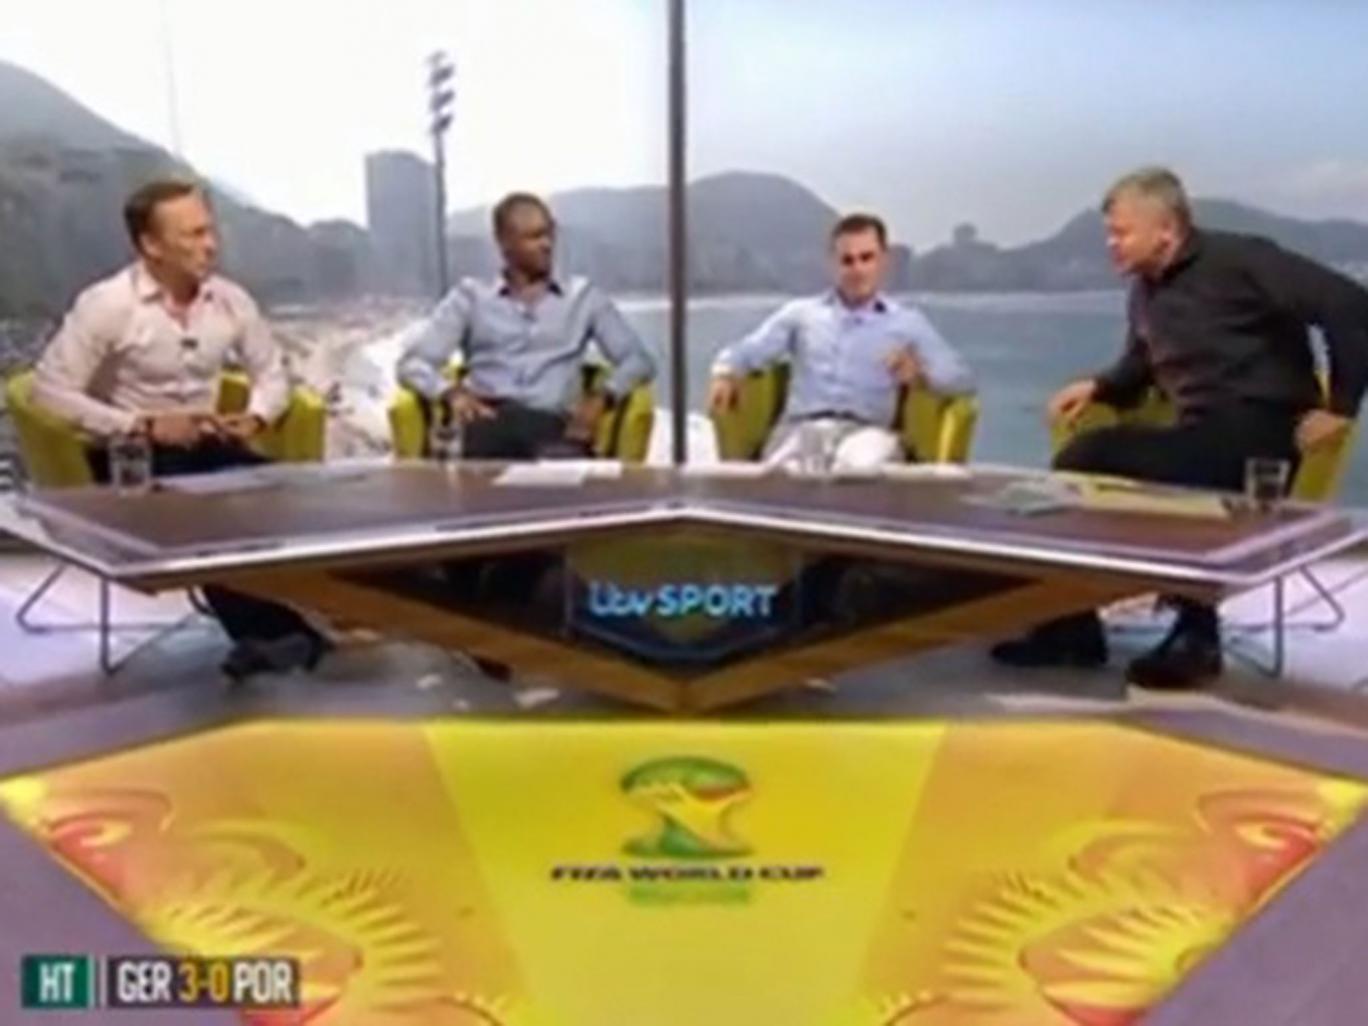 Left to right: Lee Dixon, Patrick Vieira, Fabio Cannavaro, Adrian Chiles in the ITV Studio